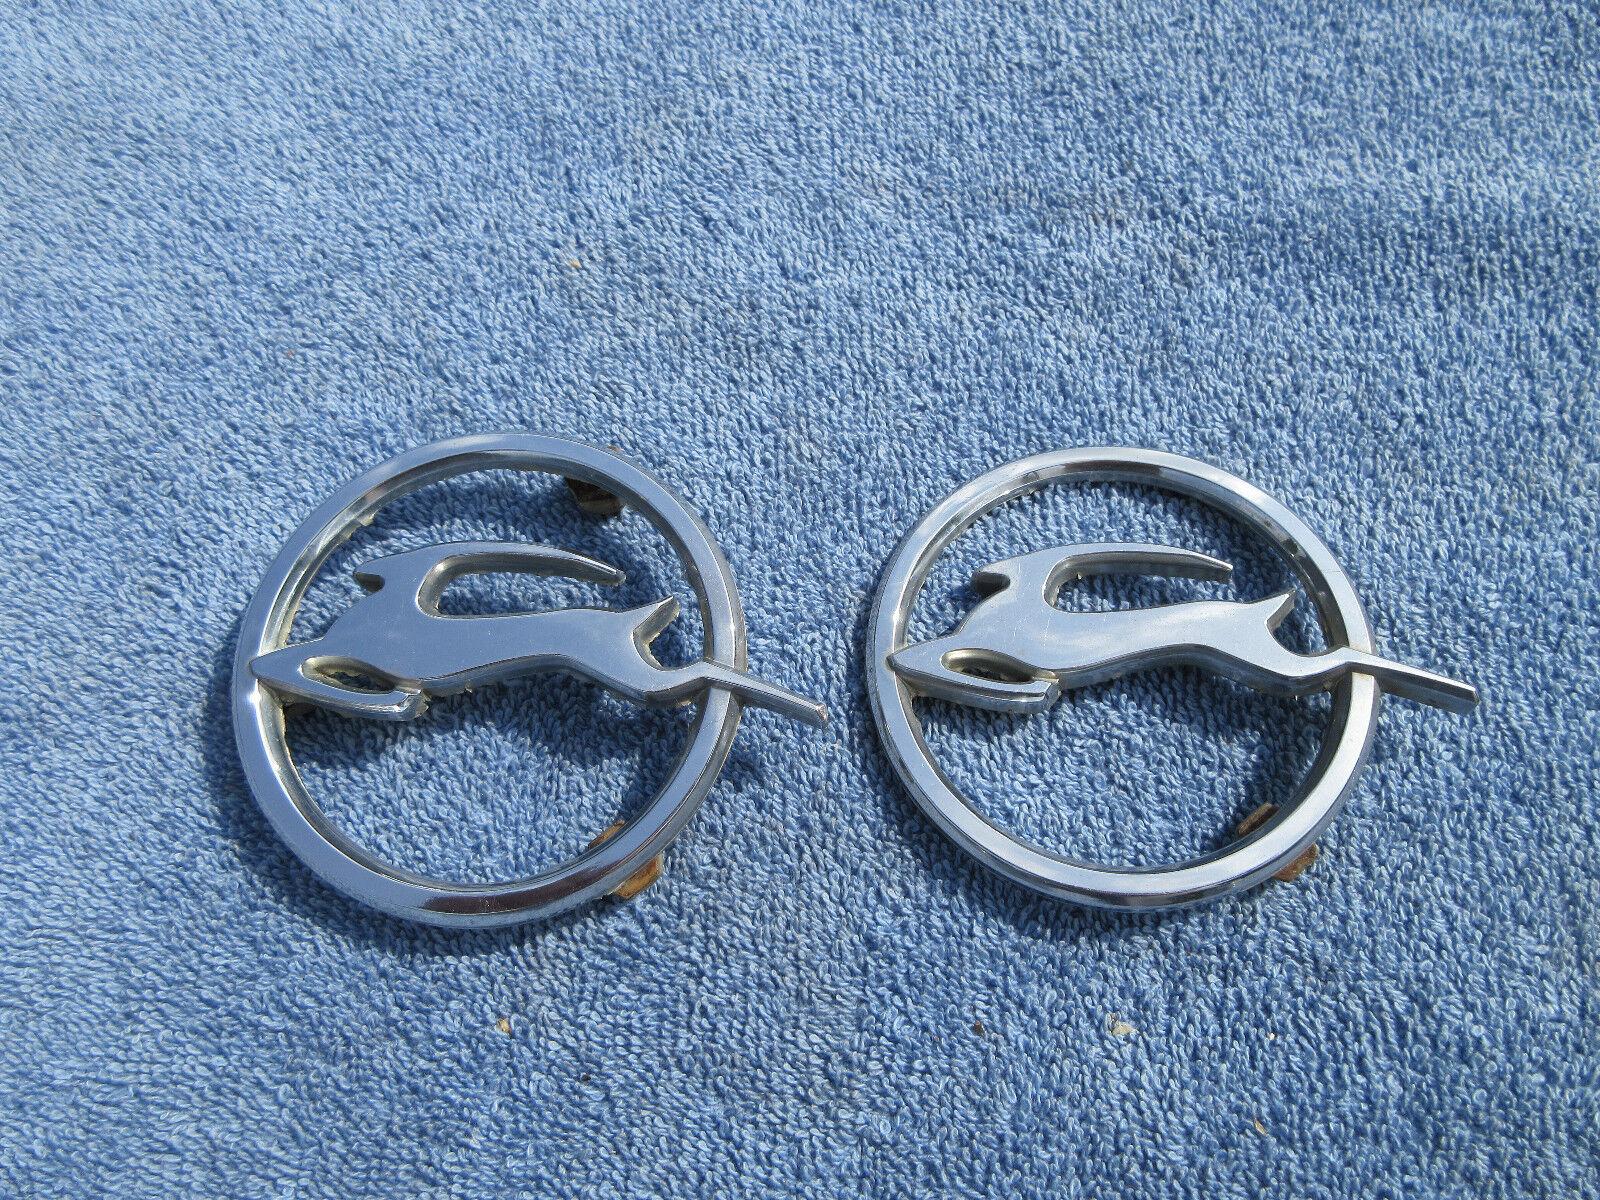 1961 1962 1963 Chevrolet Impala rear quarter panel emblems